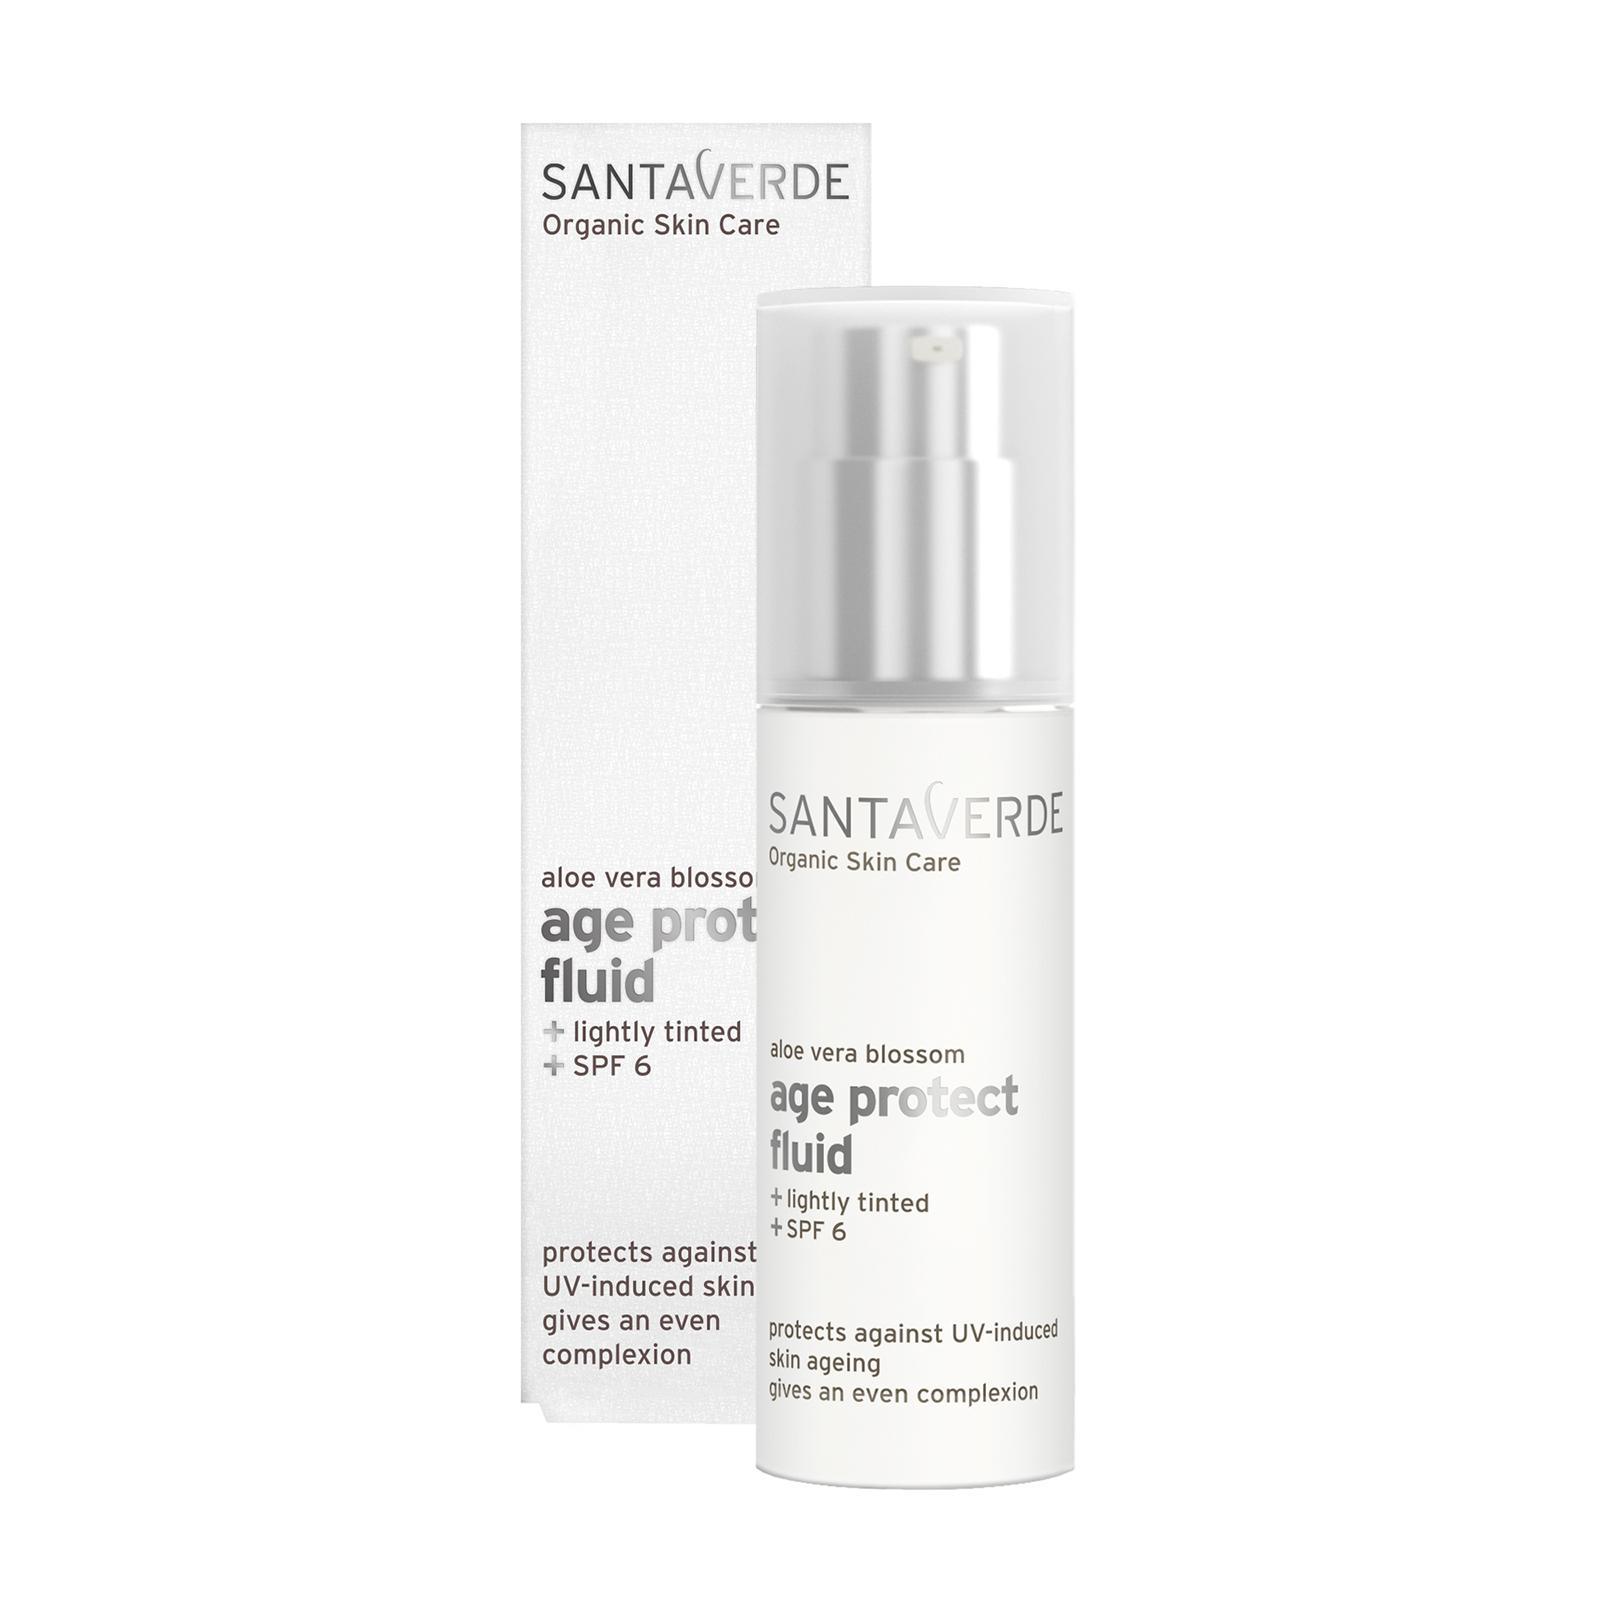 Santaverde Ochranný fluid SPF 6, age protect 30 ml